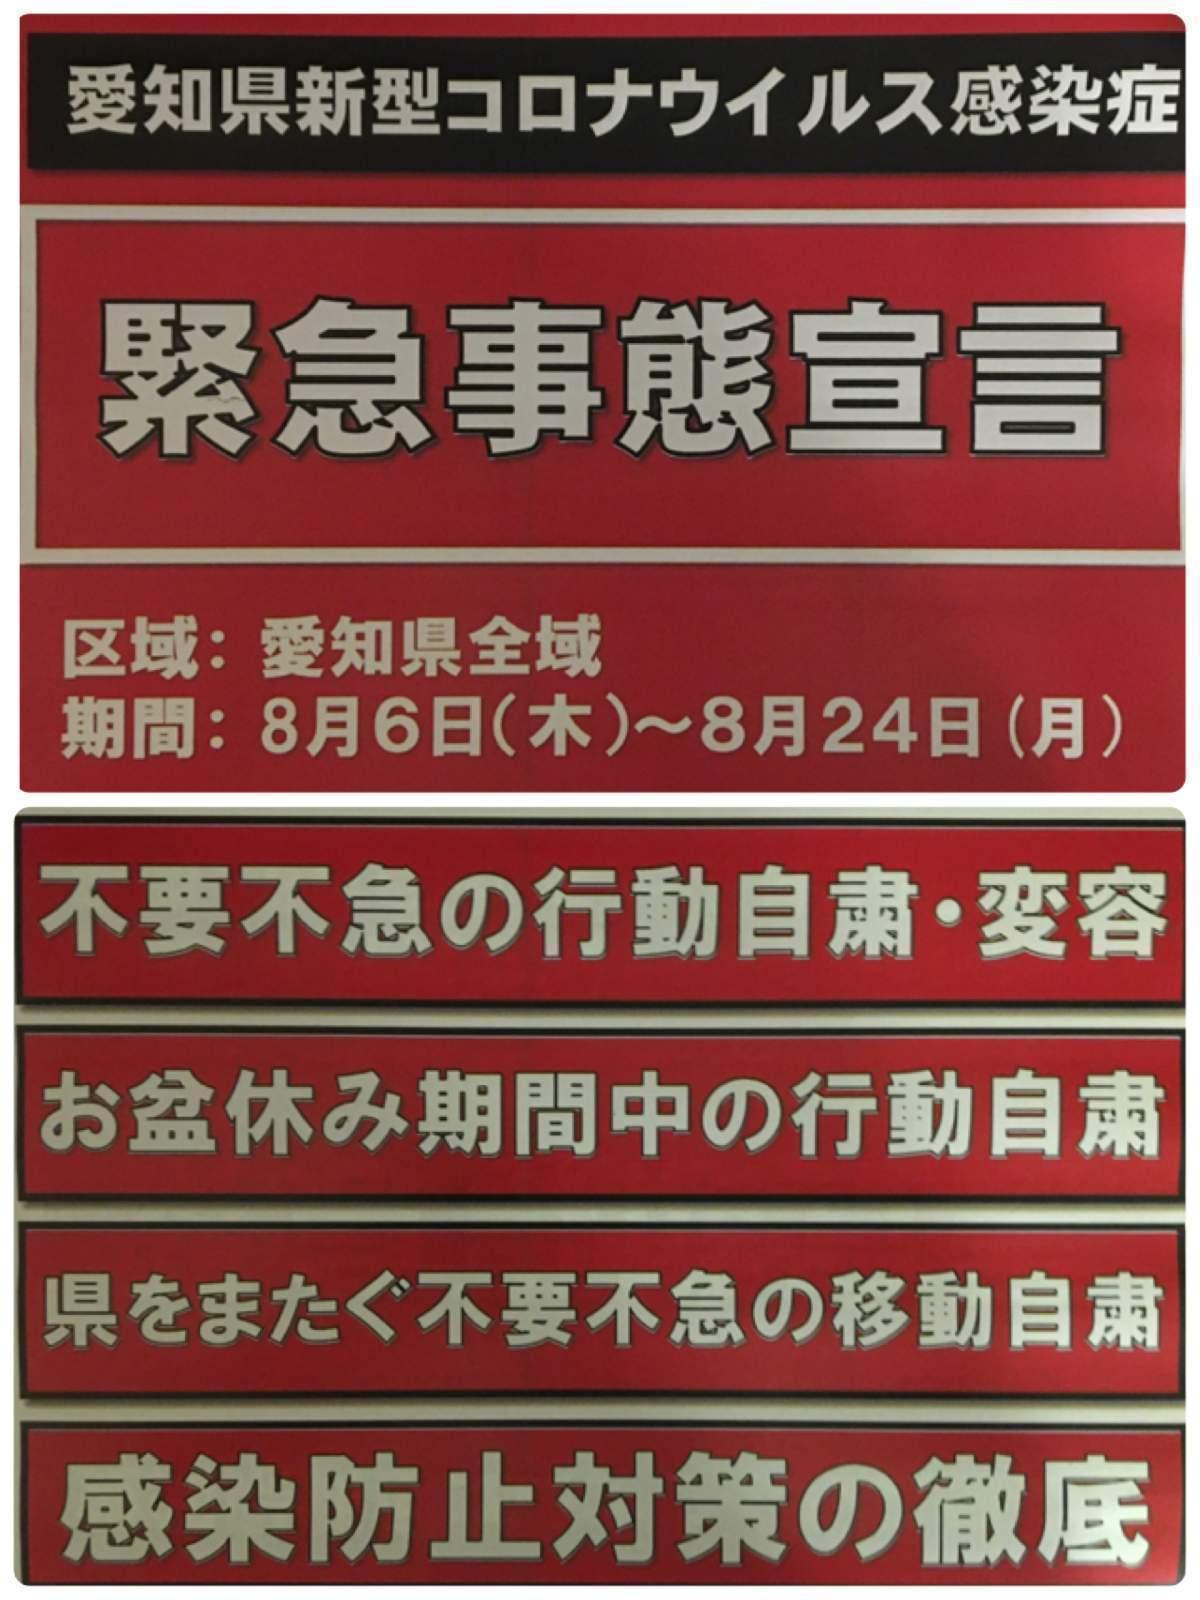 8CDE25B8-EB5F-4C50-BA7A-78B4B1835368